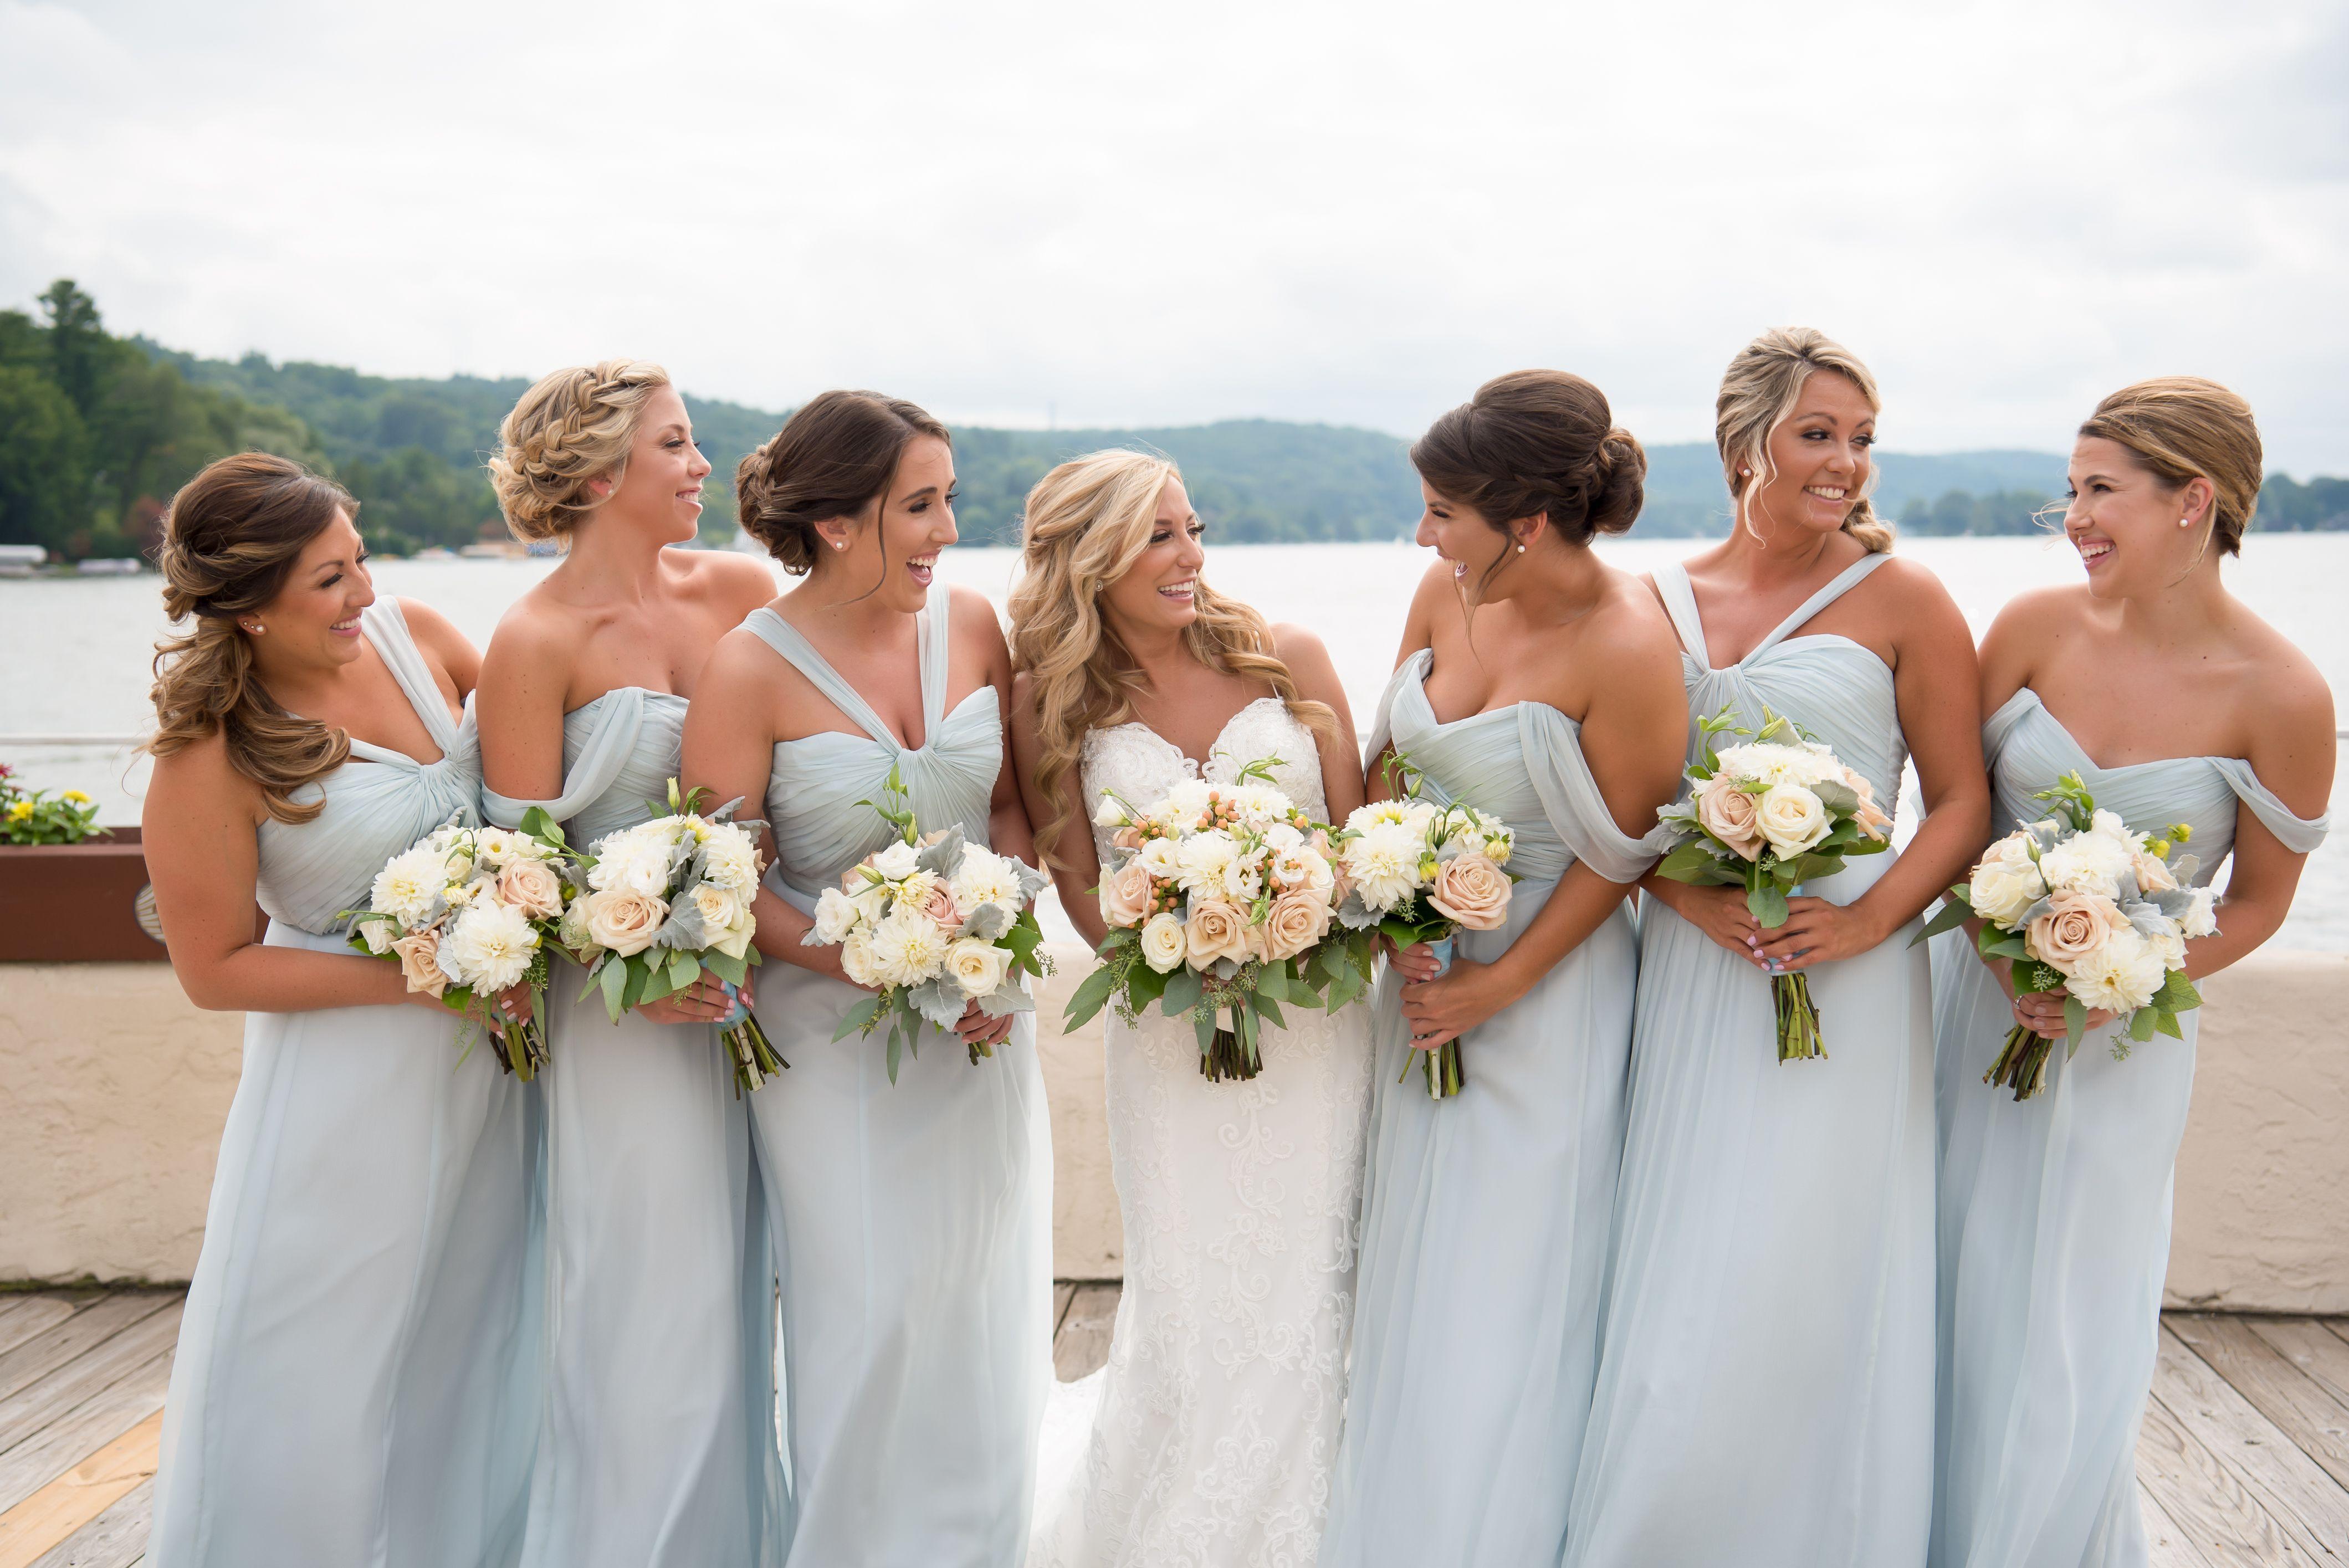 Bella Bridesmaids Madison Shop Bridesmaids Dresses In Store Ice Blue Bridesmaid Dress Blue Wedding Inspiration Amsale Bridesmaid Dresses [ 2830 x 4239 Pixel ]